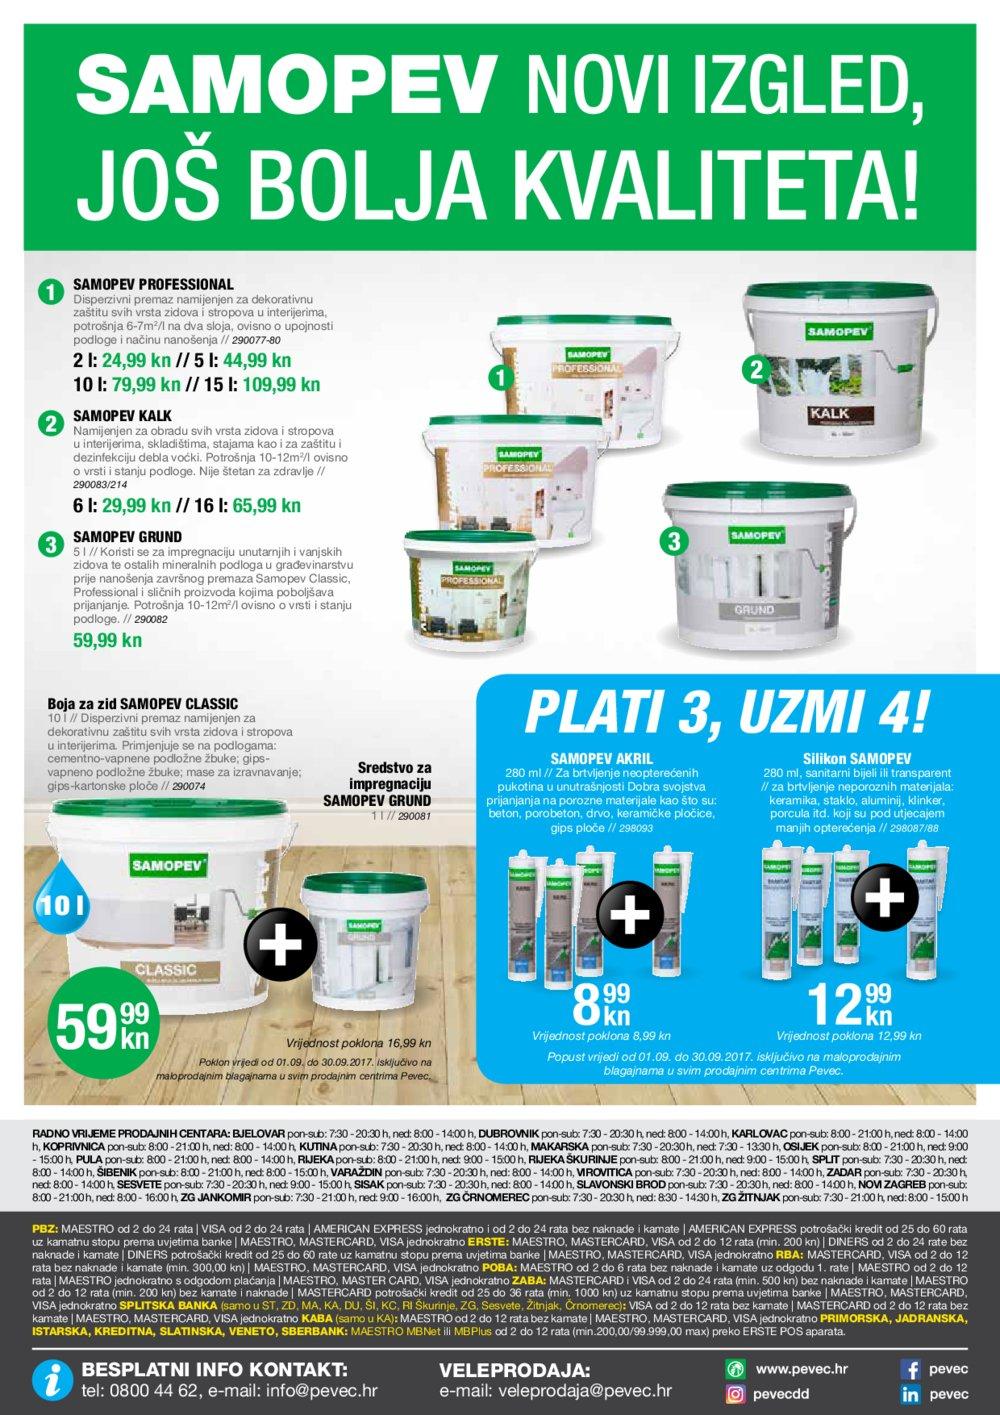 Pevec katalog Super ponuda 07.09.-30.09.2017.